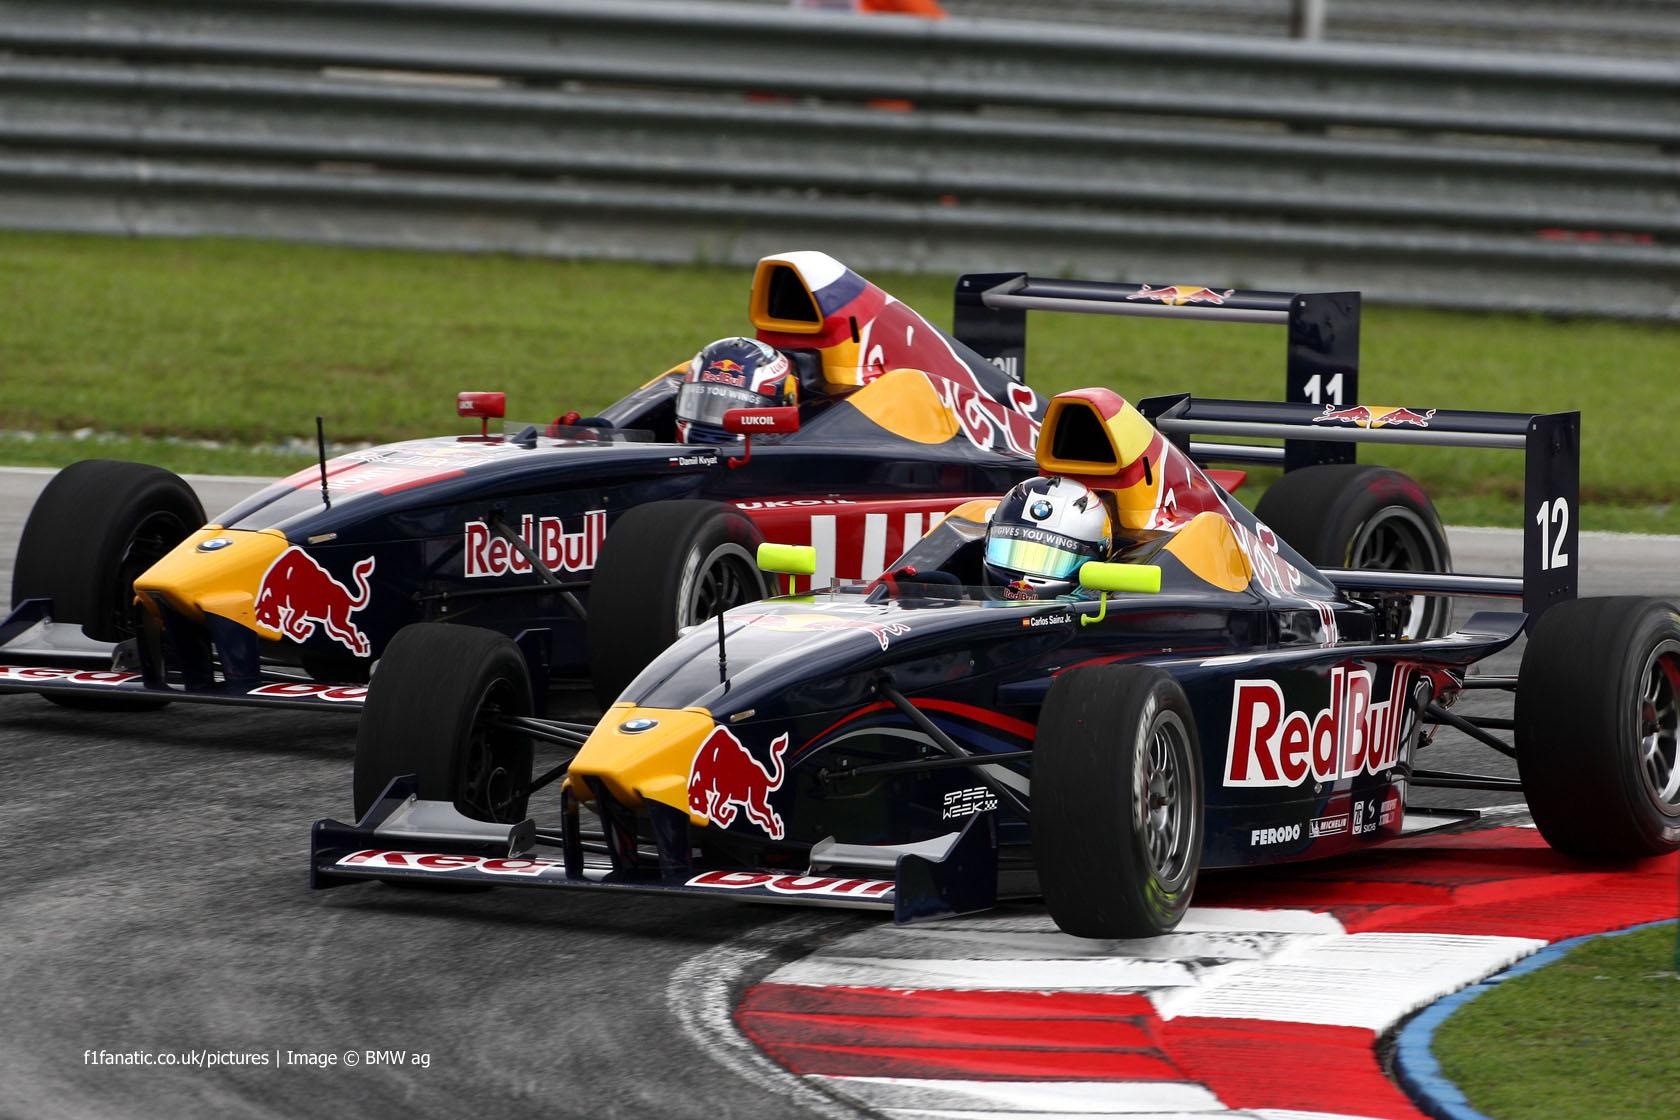 Carlos Sainz Jnr, Daniil Kvyat, Formula BMW Pacific, EuroInternational, Sepang, 2010